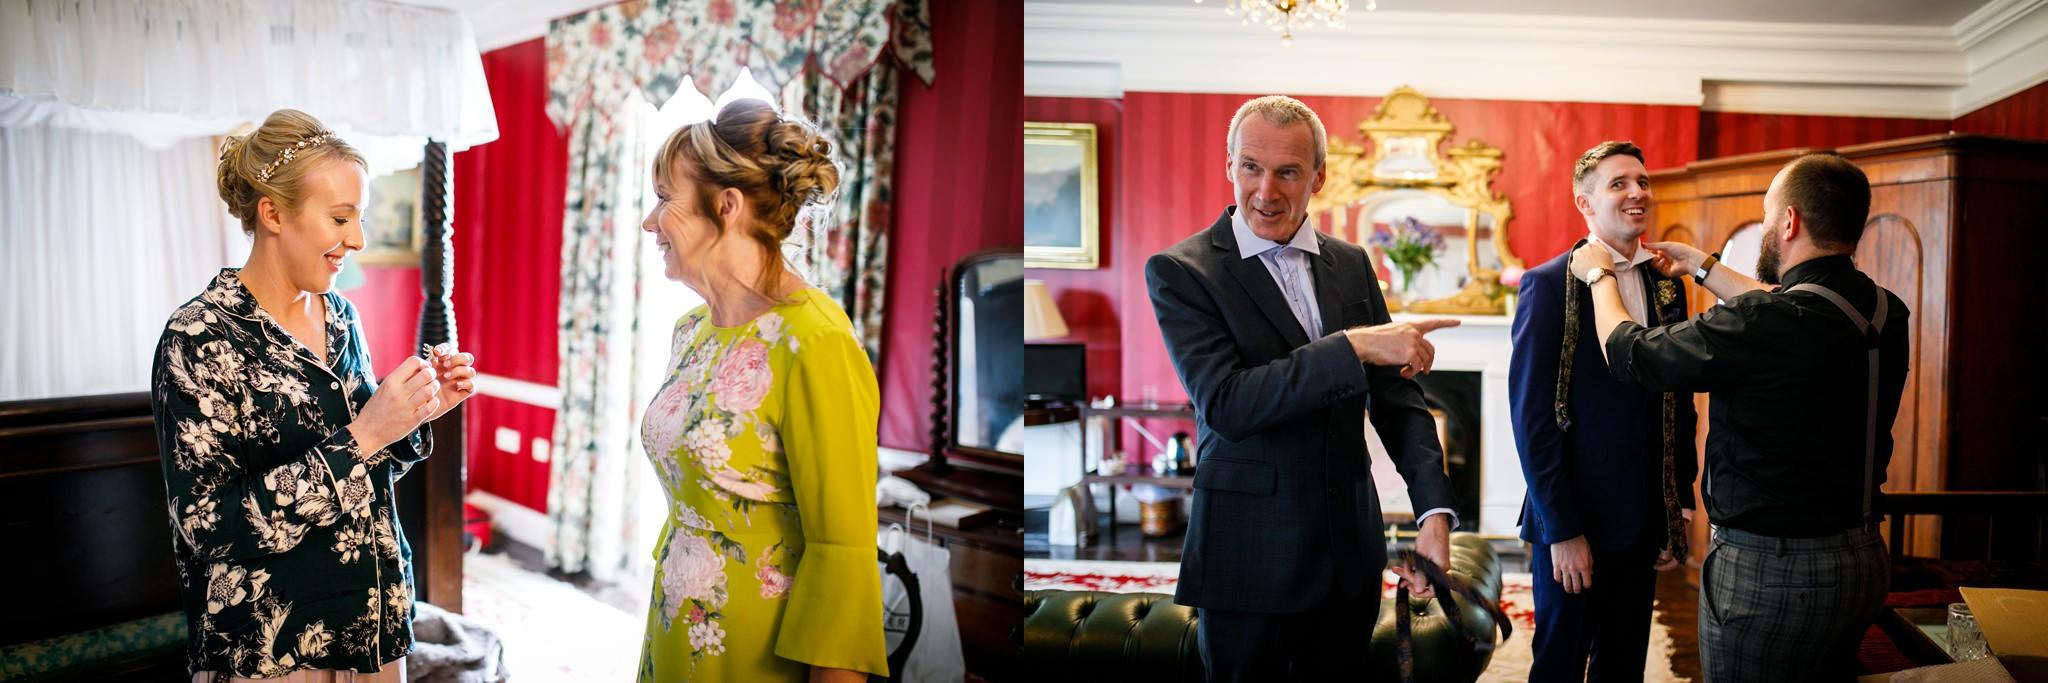 Elisha-Clarke-Photography-Dublin-City-Wedding_0044.jpg